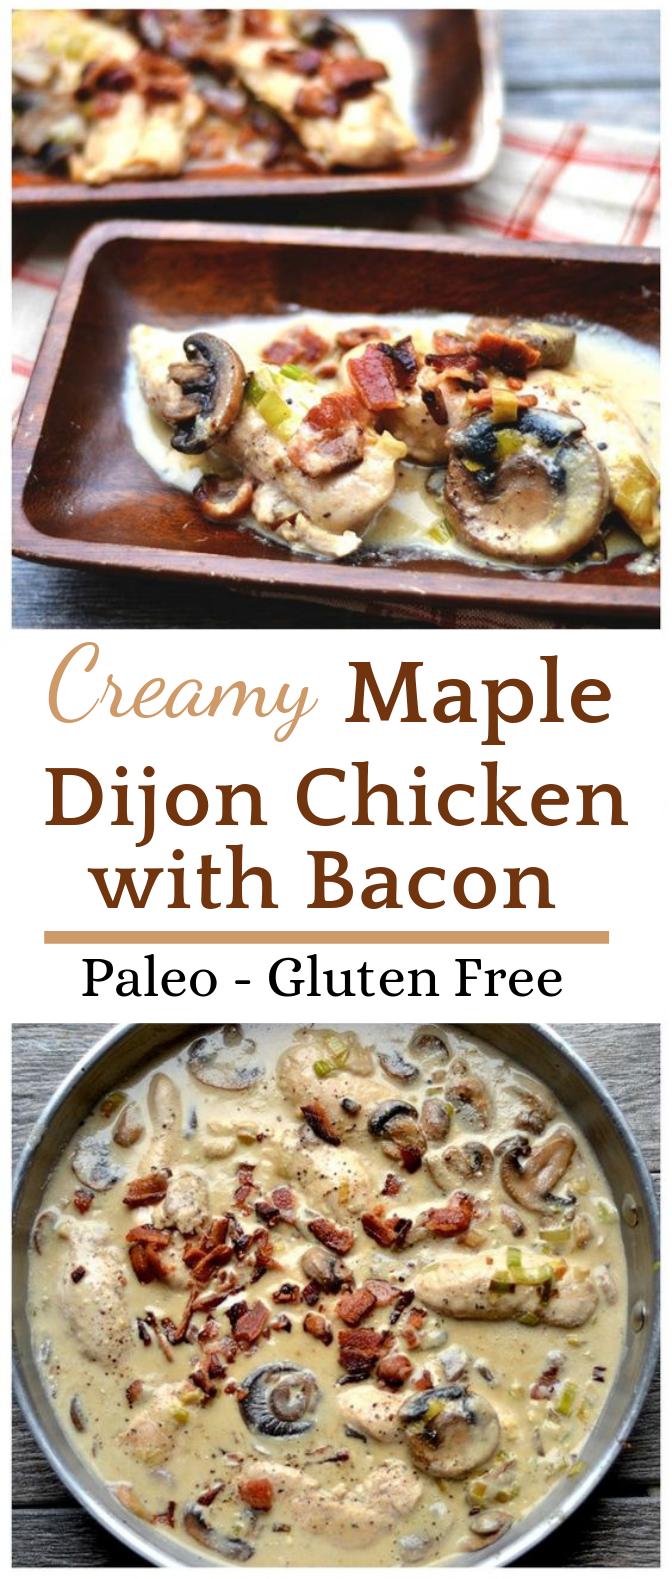 CREAMY MAPLE DIJON CHICKEN WITH BACON (PALEO) #Paleo #Chicken